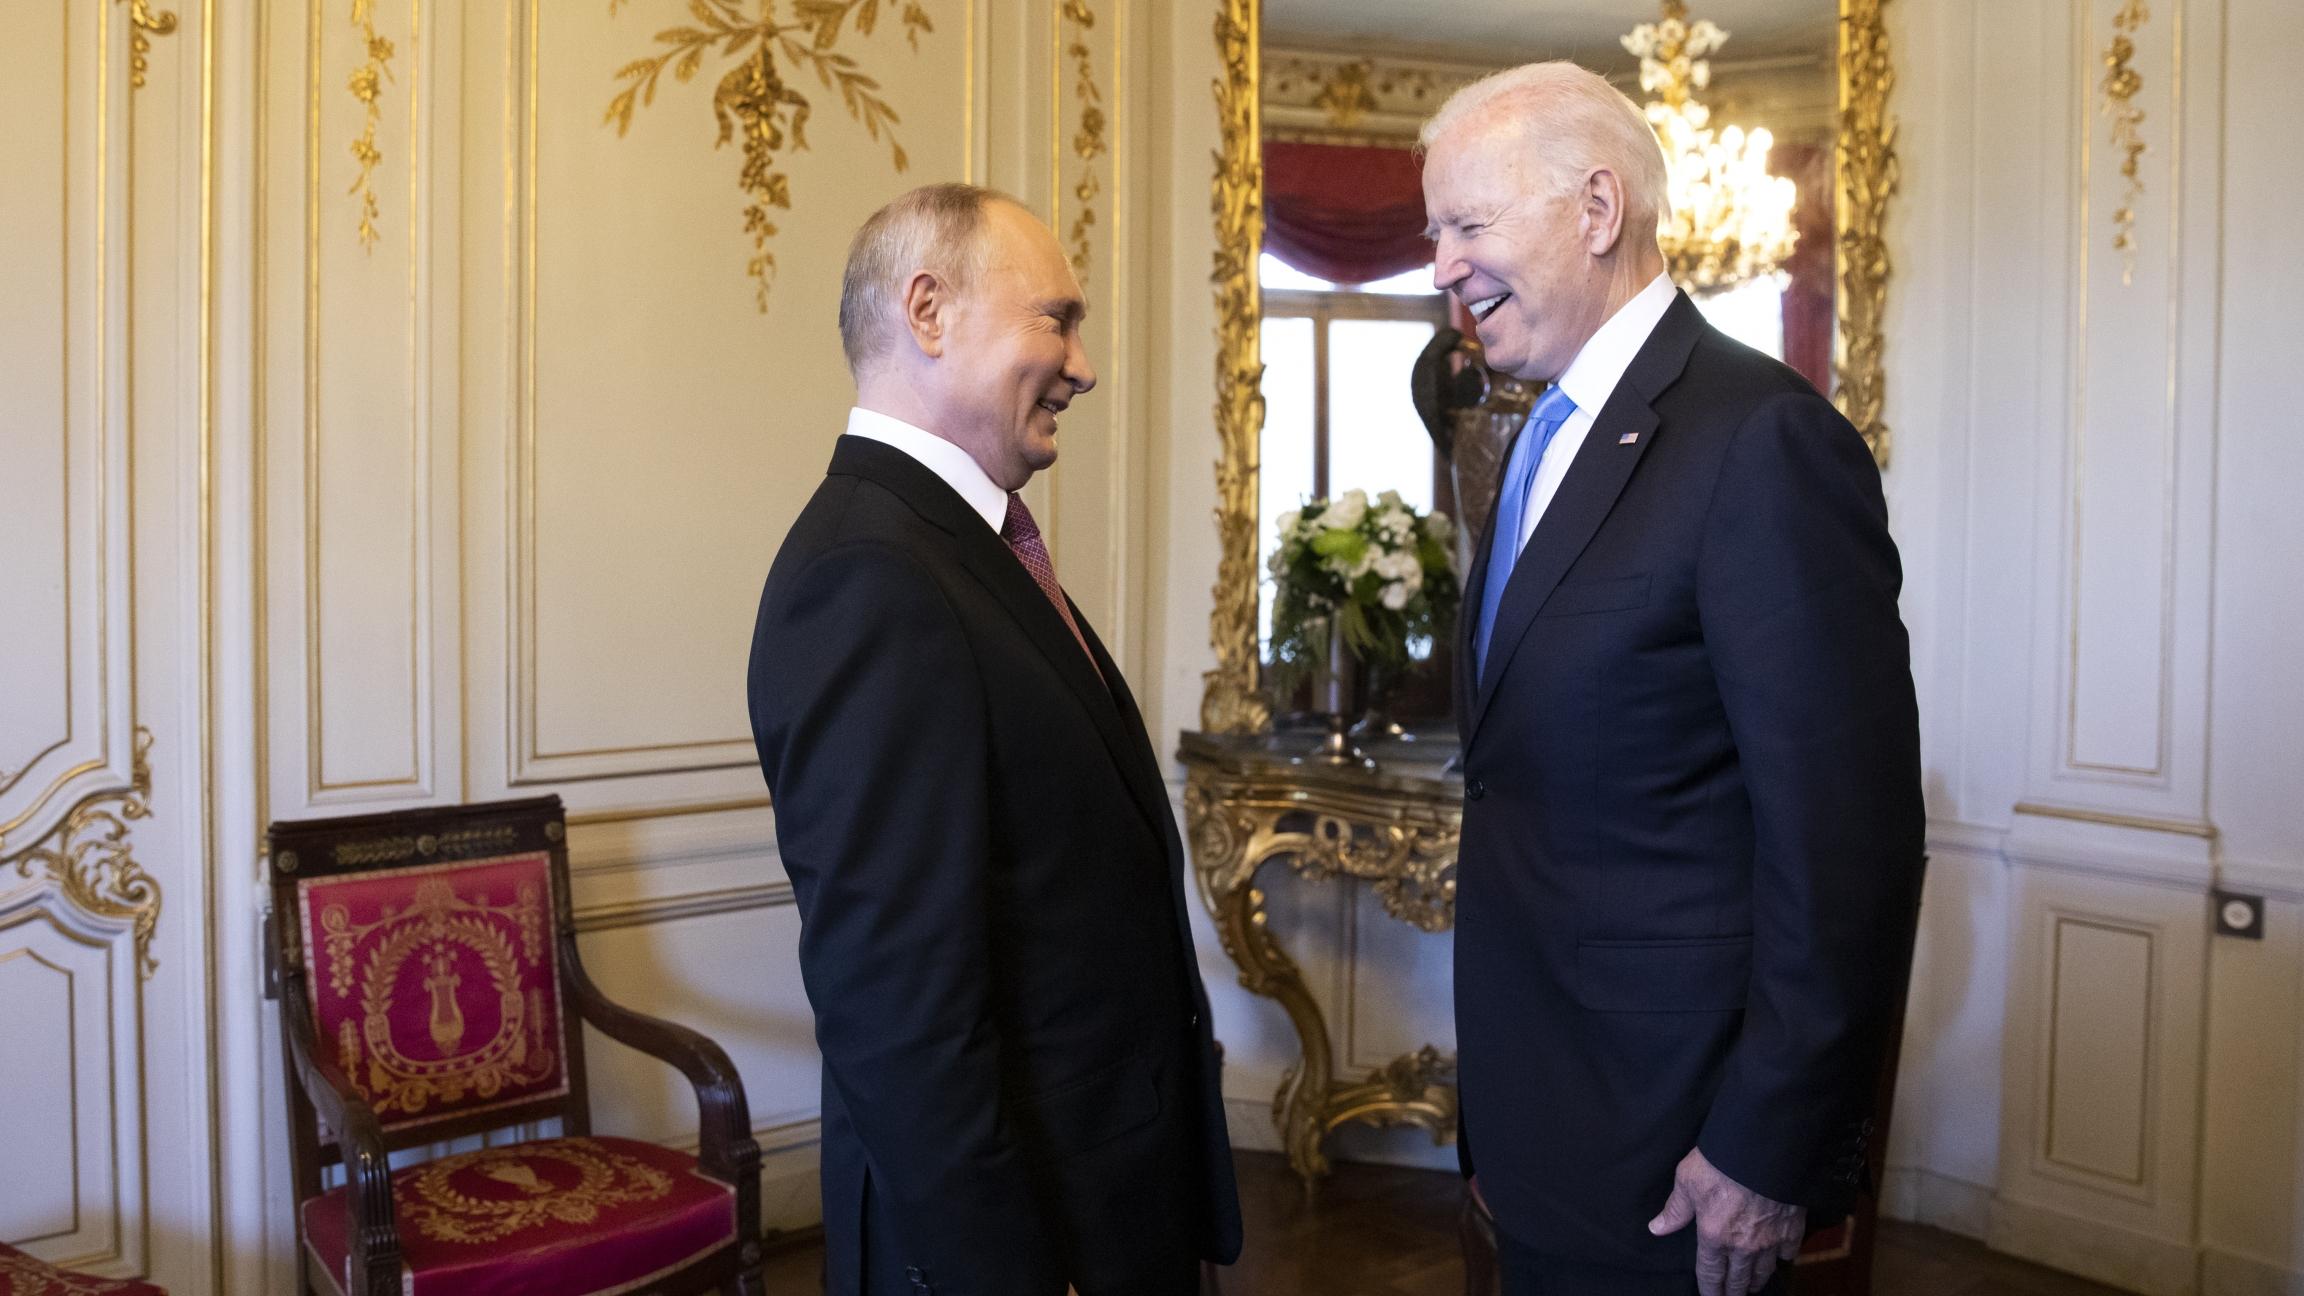 Russian president Vladimir Putin, left, talks with US President Joe Biden, right, during the US-Russia summit in Geneva, Switzerland, Wednesday, June 16, 2021.